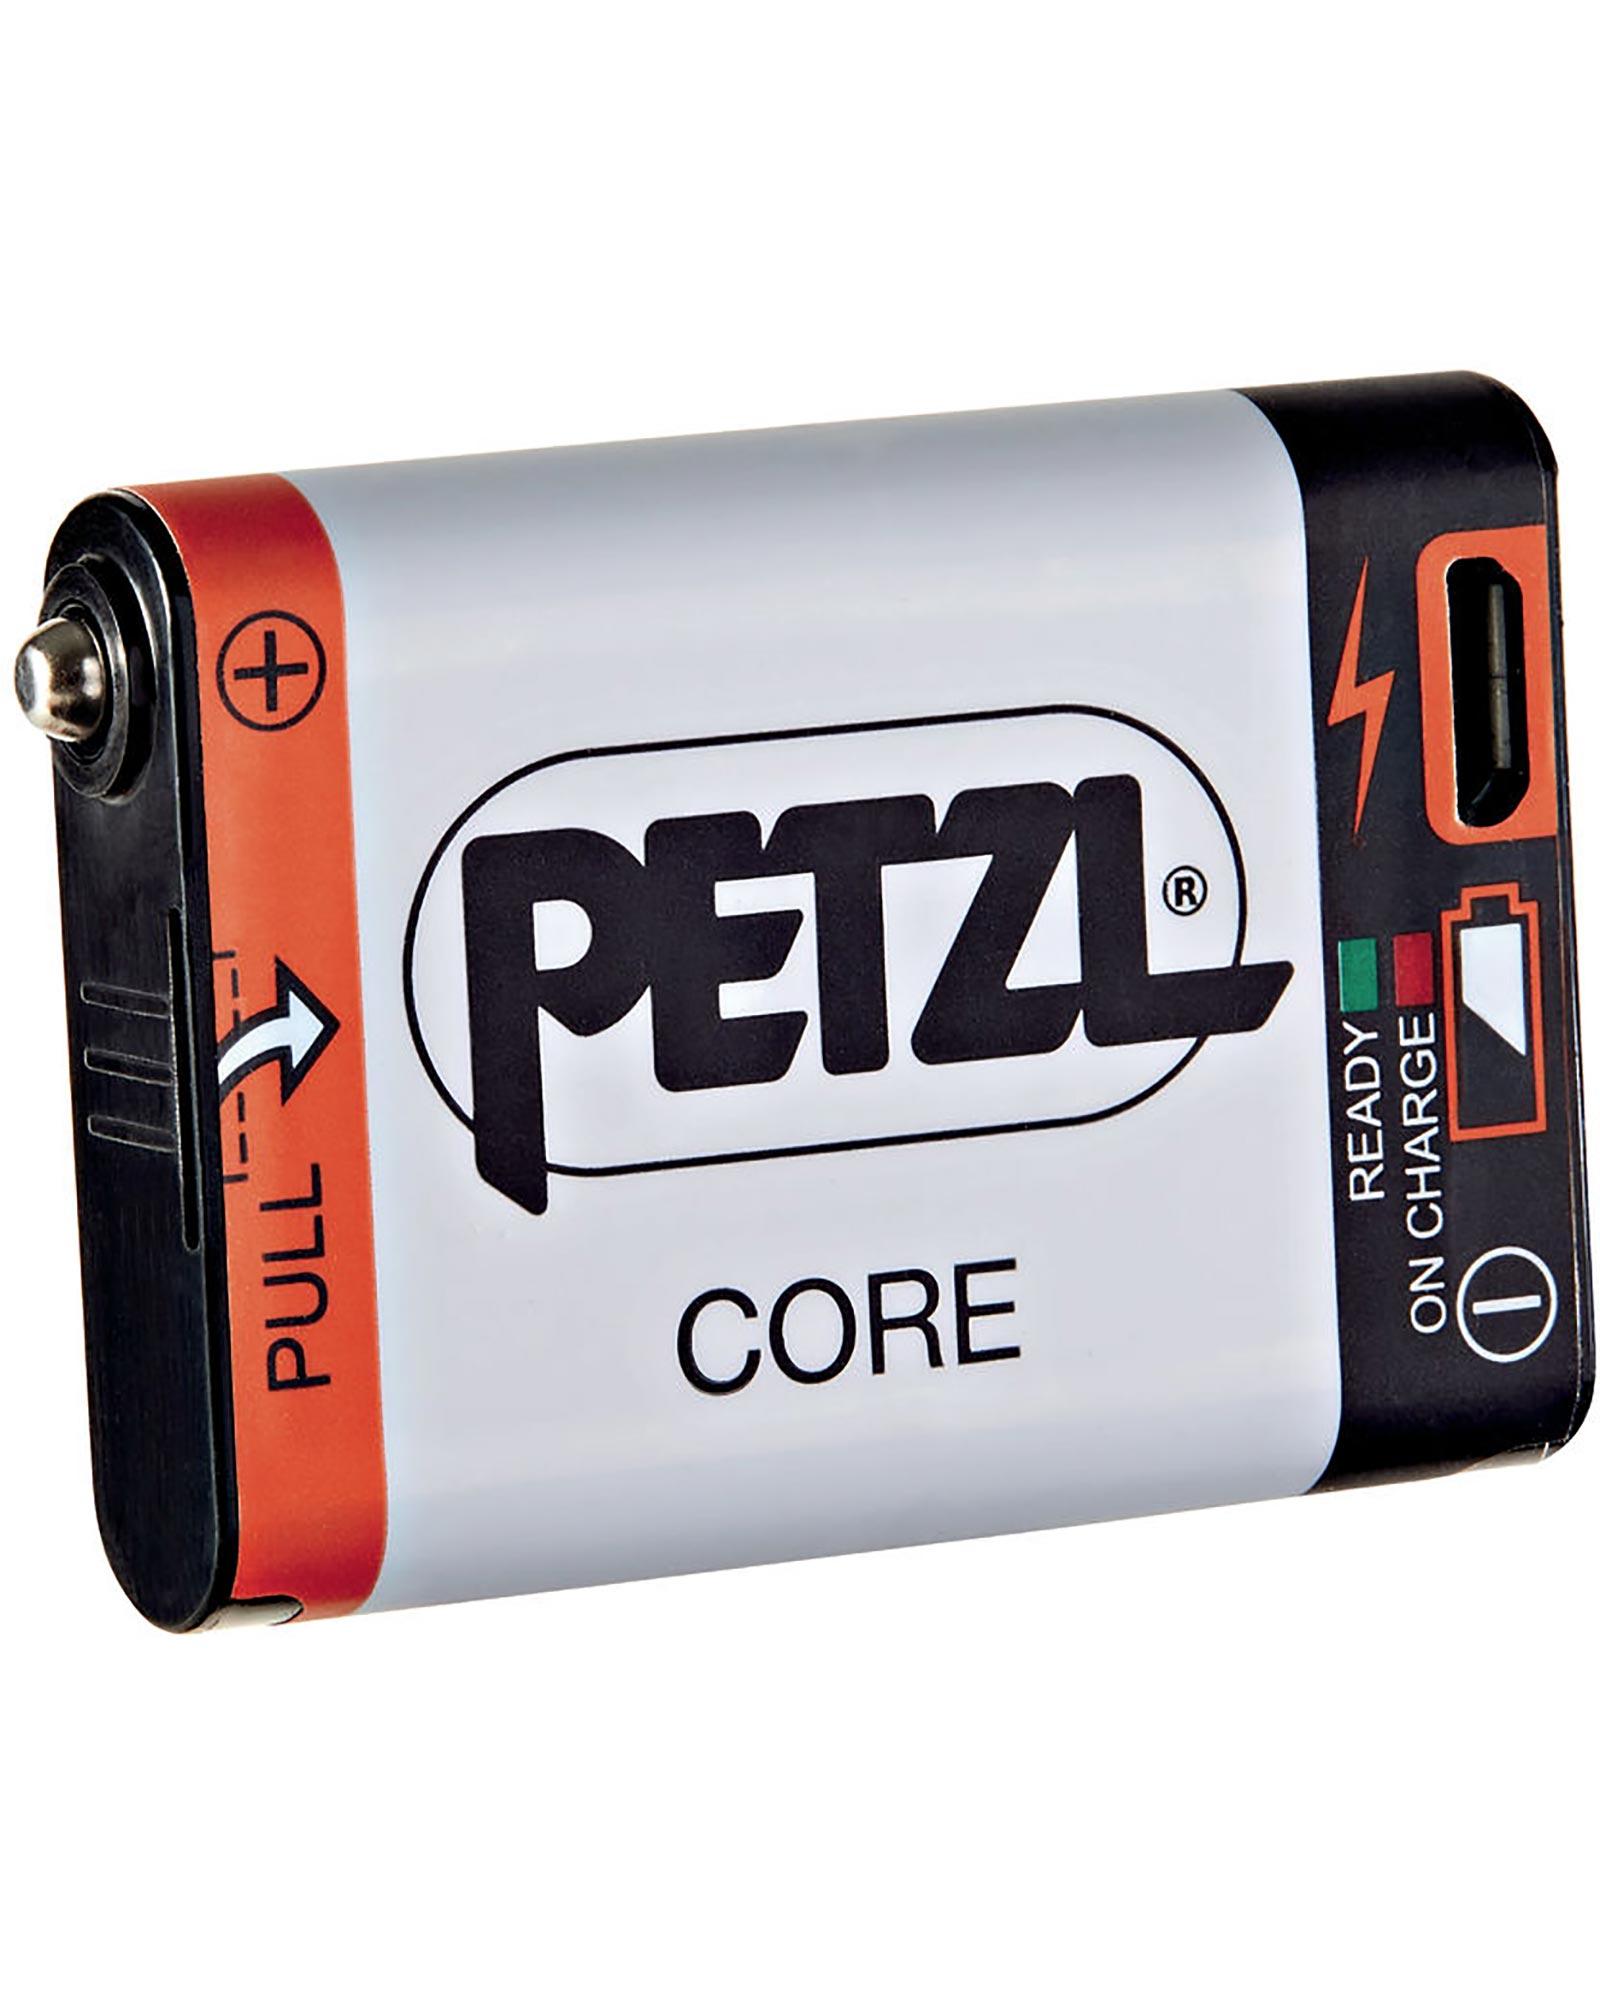 Petzl Core Battery 0